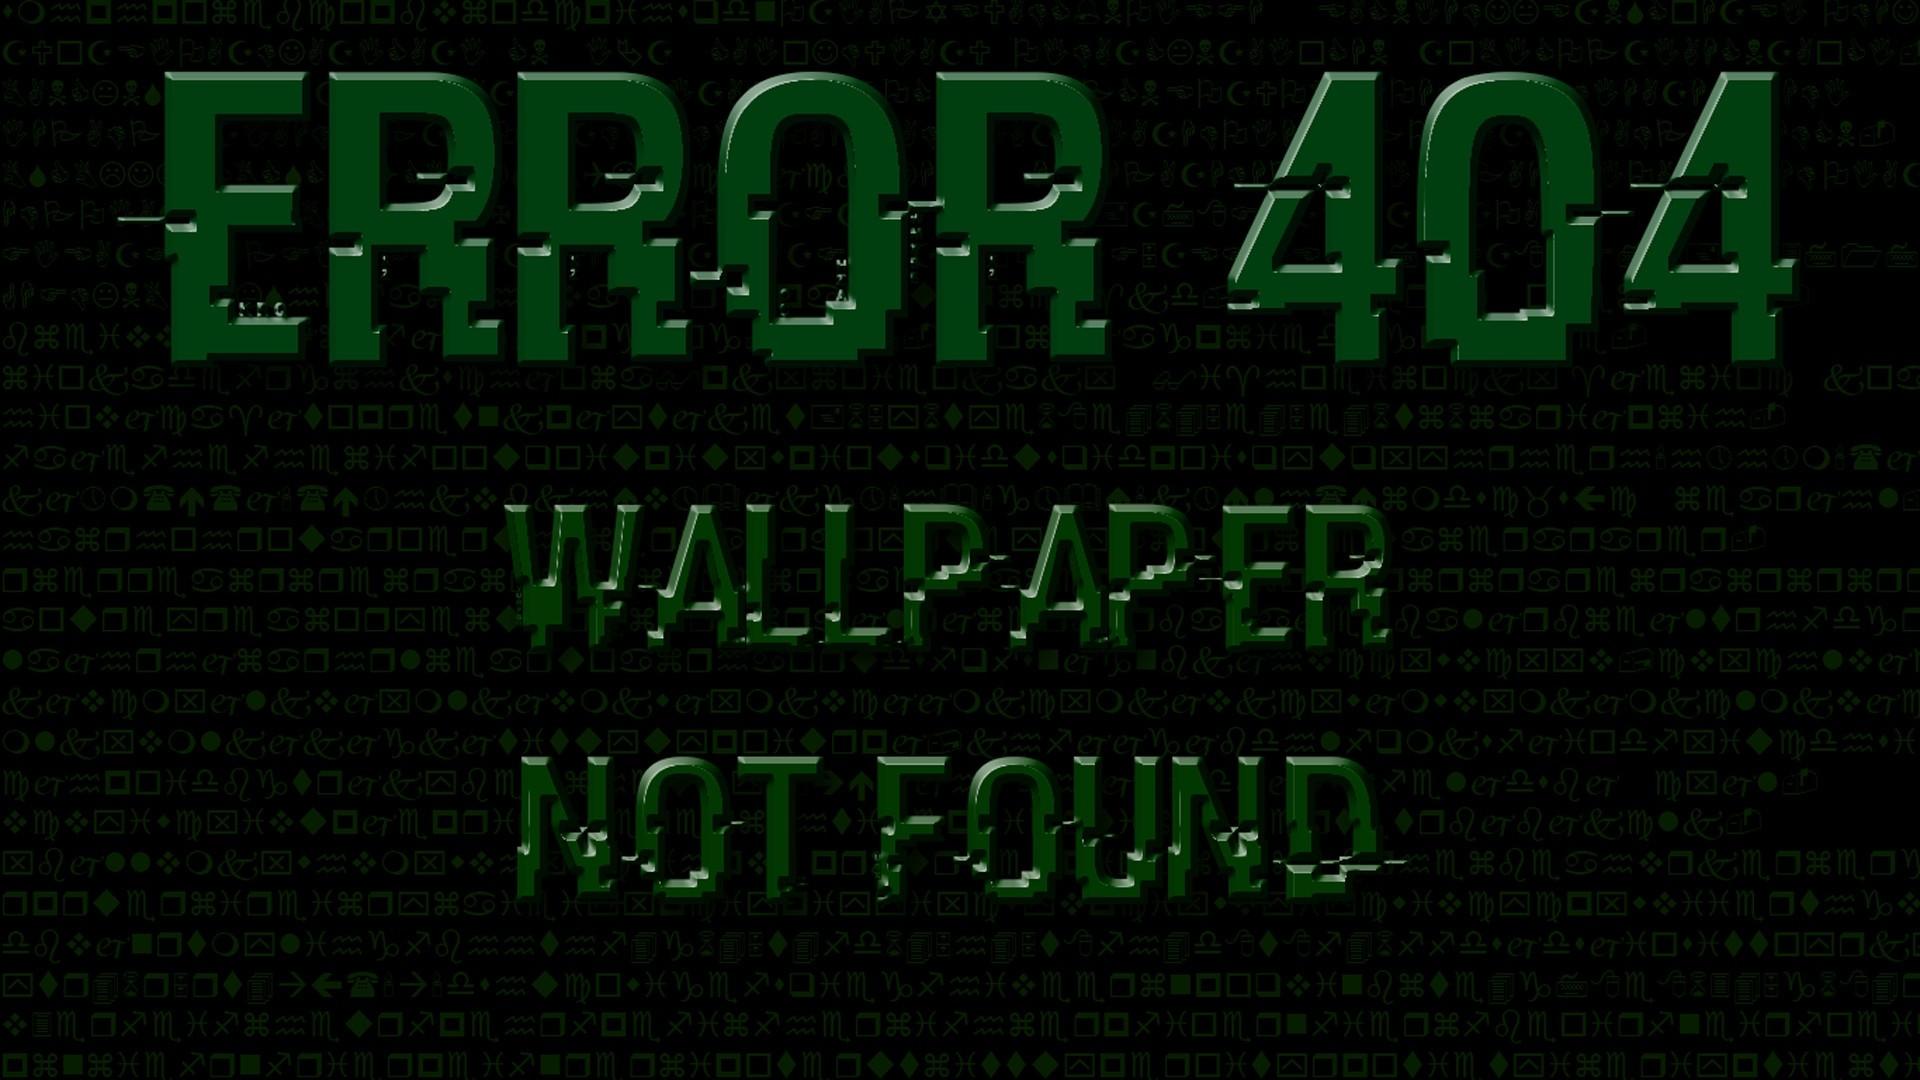 Error 404 wallpaper photo hd